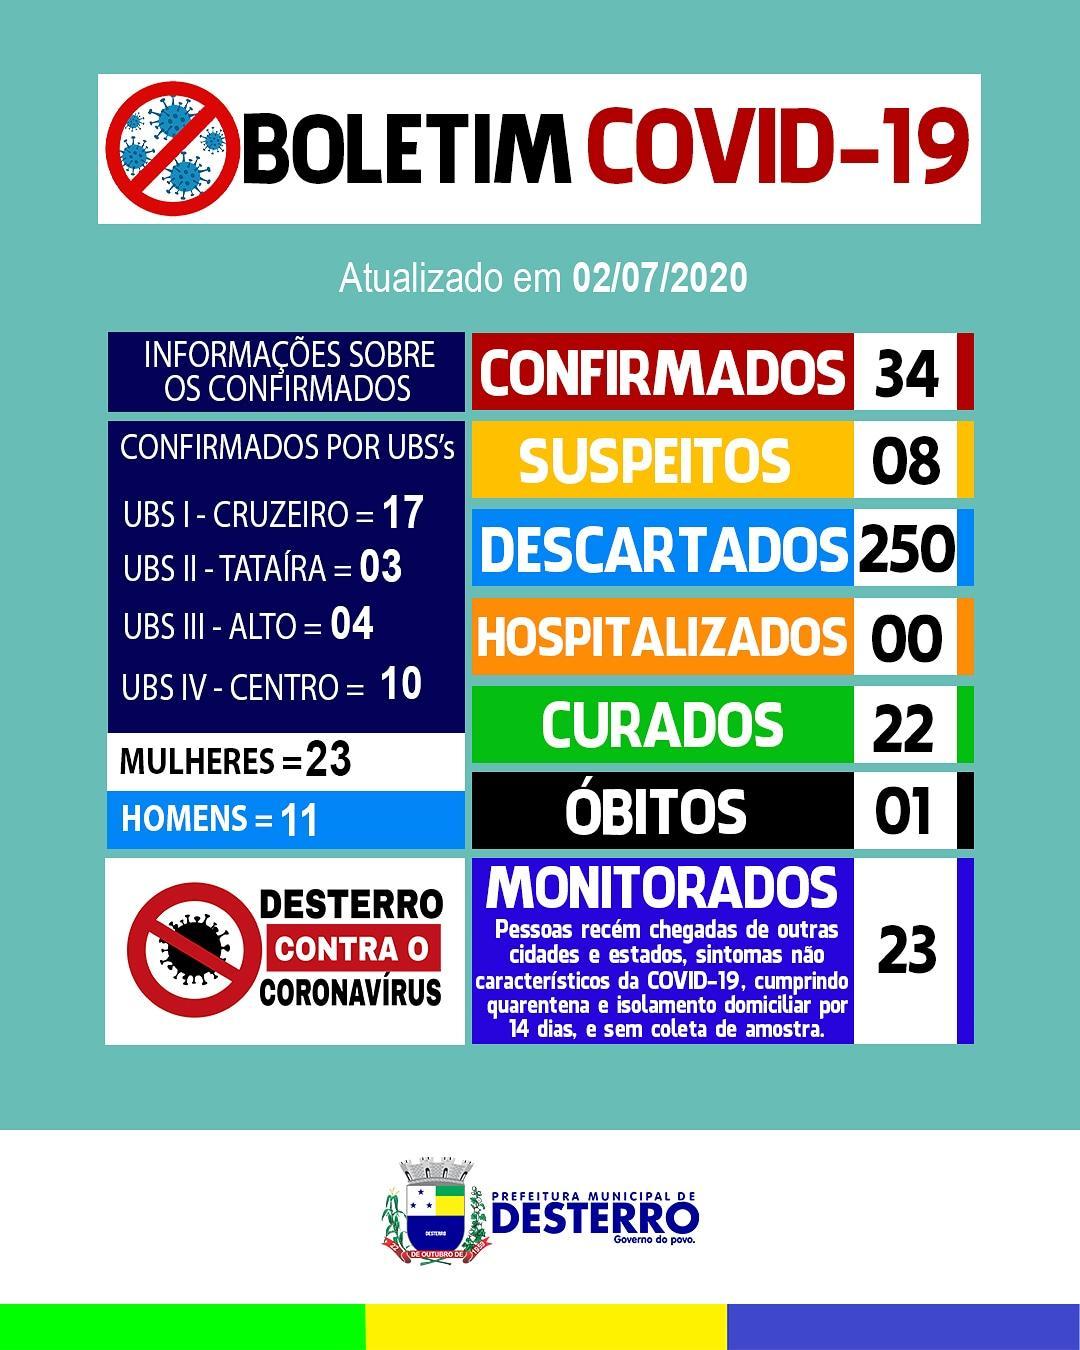 Boletim Covid-19 (02/07/2020)